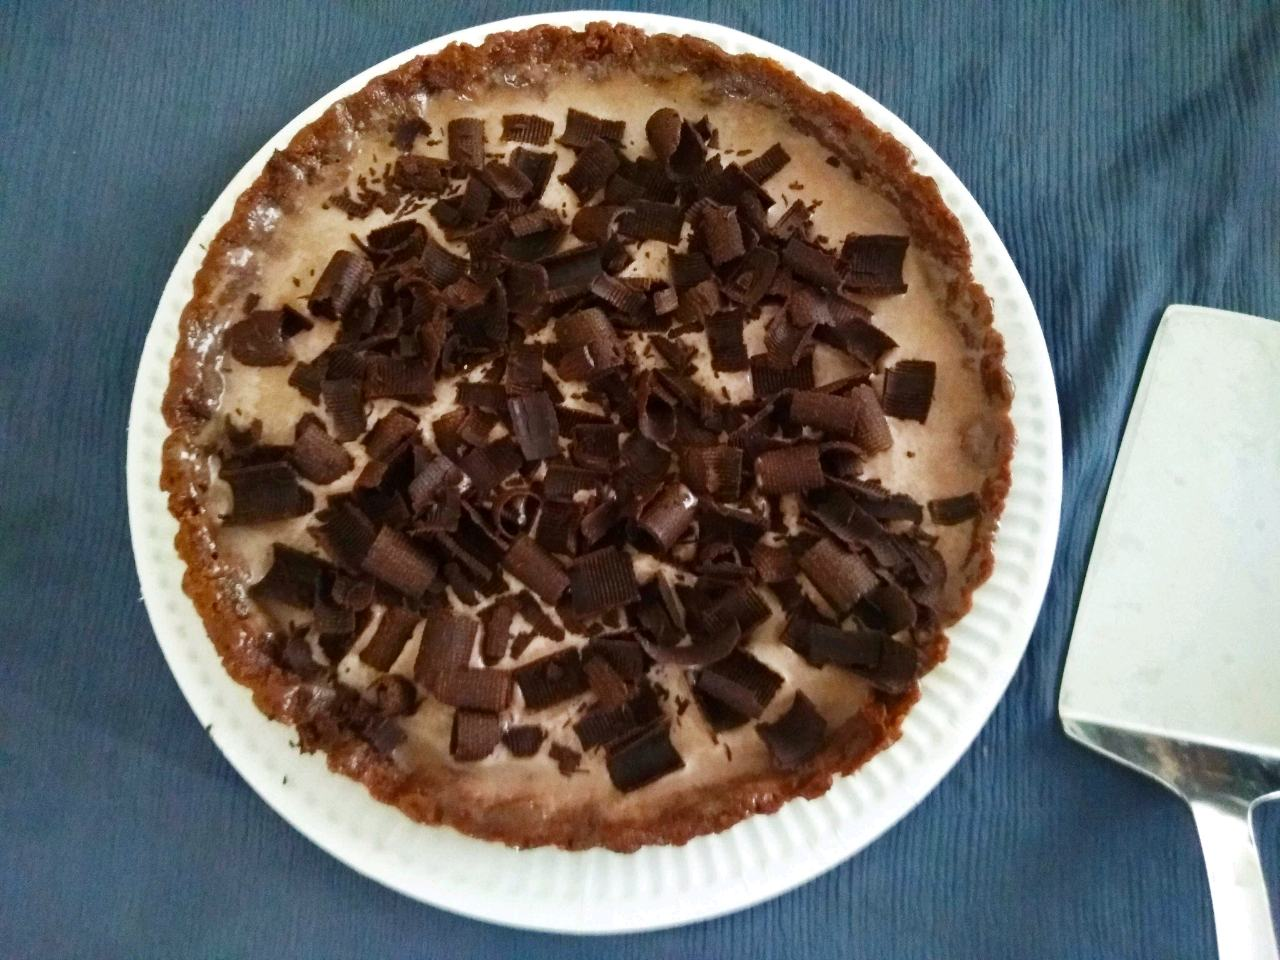 Chocolate Chip Ice-cream Pie